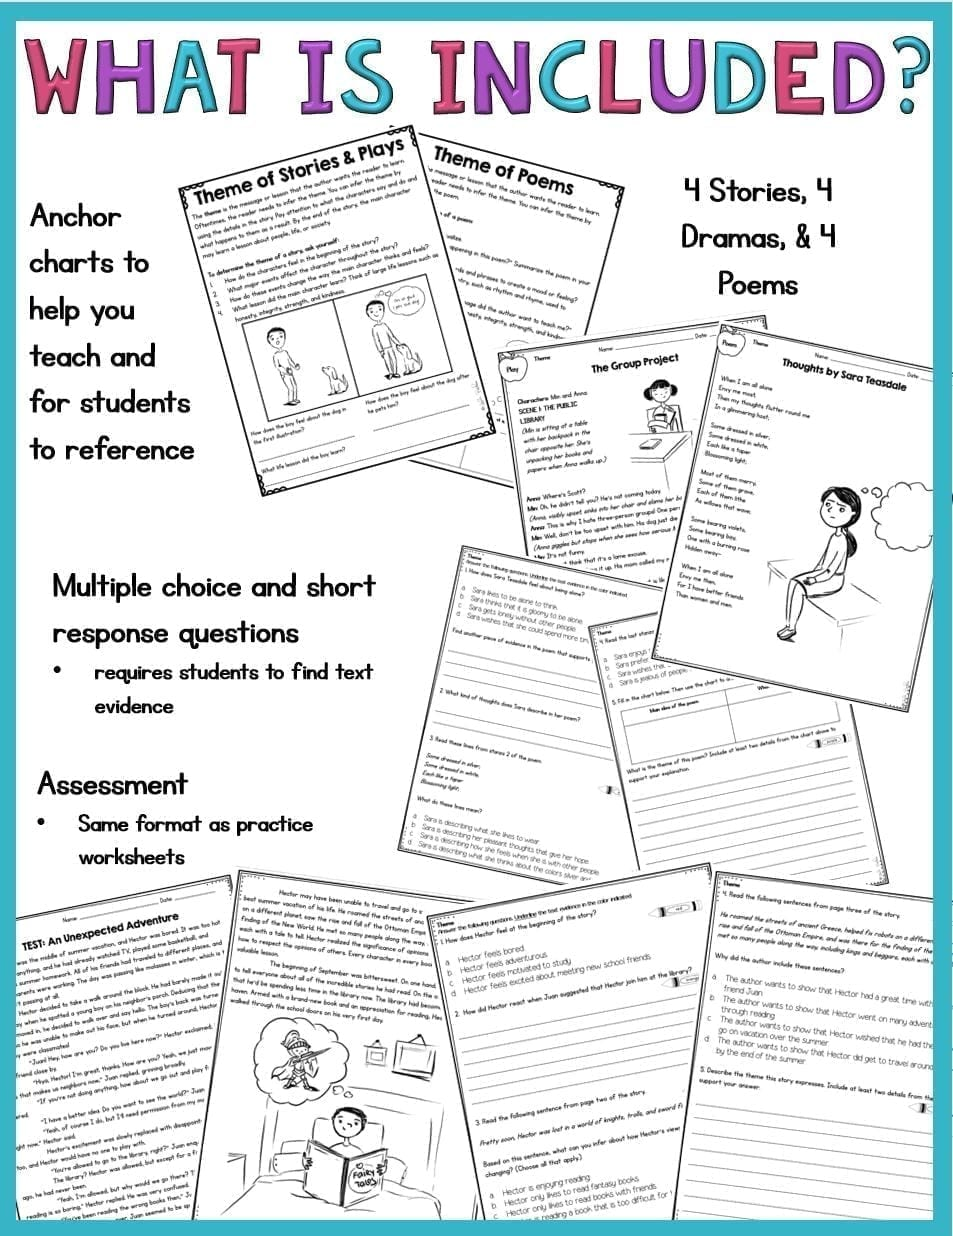 Poems 4th Grade Rl 4 2 And 5th